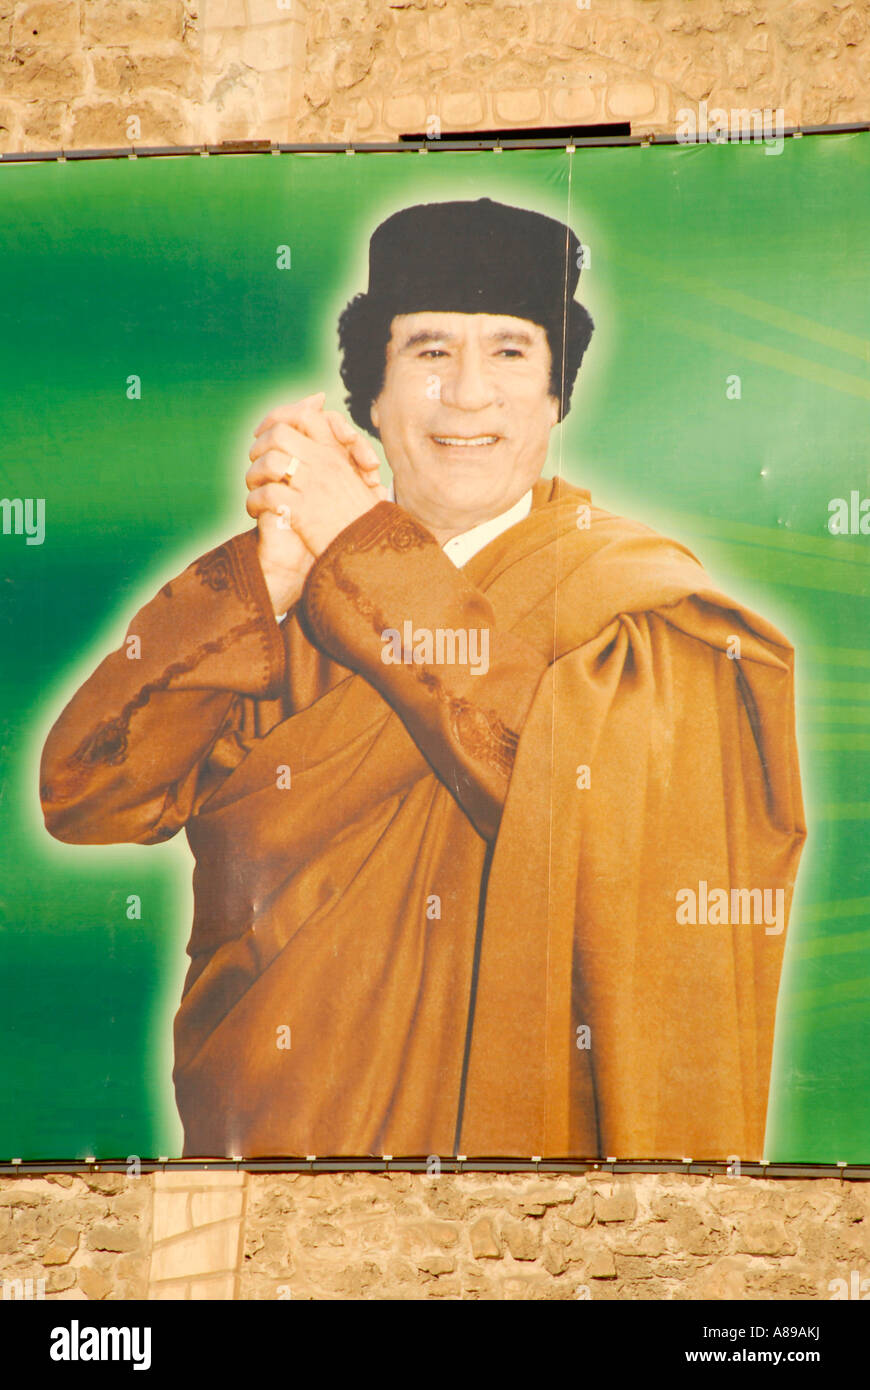 Bill of Muammar al Gaddafi as victor Green Square Tripolis Libya - Stock Image